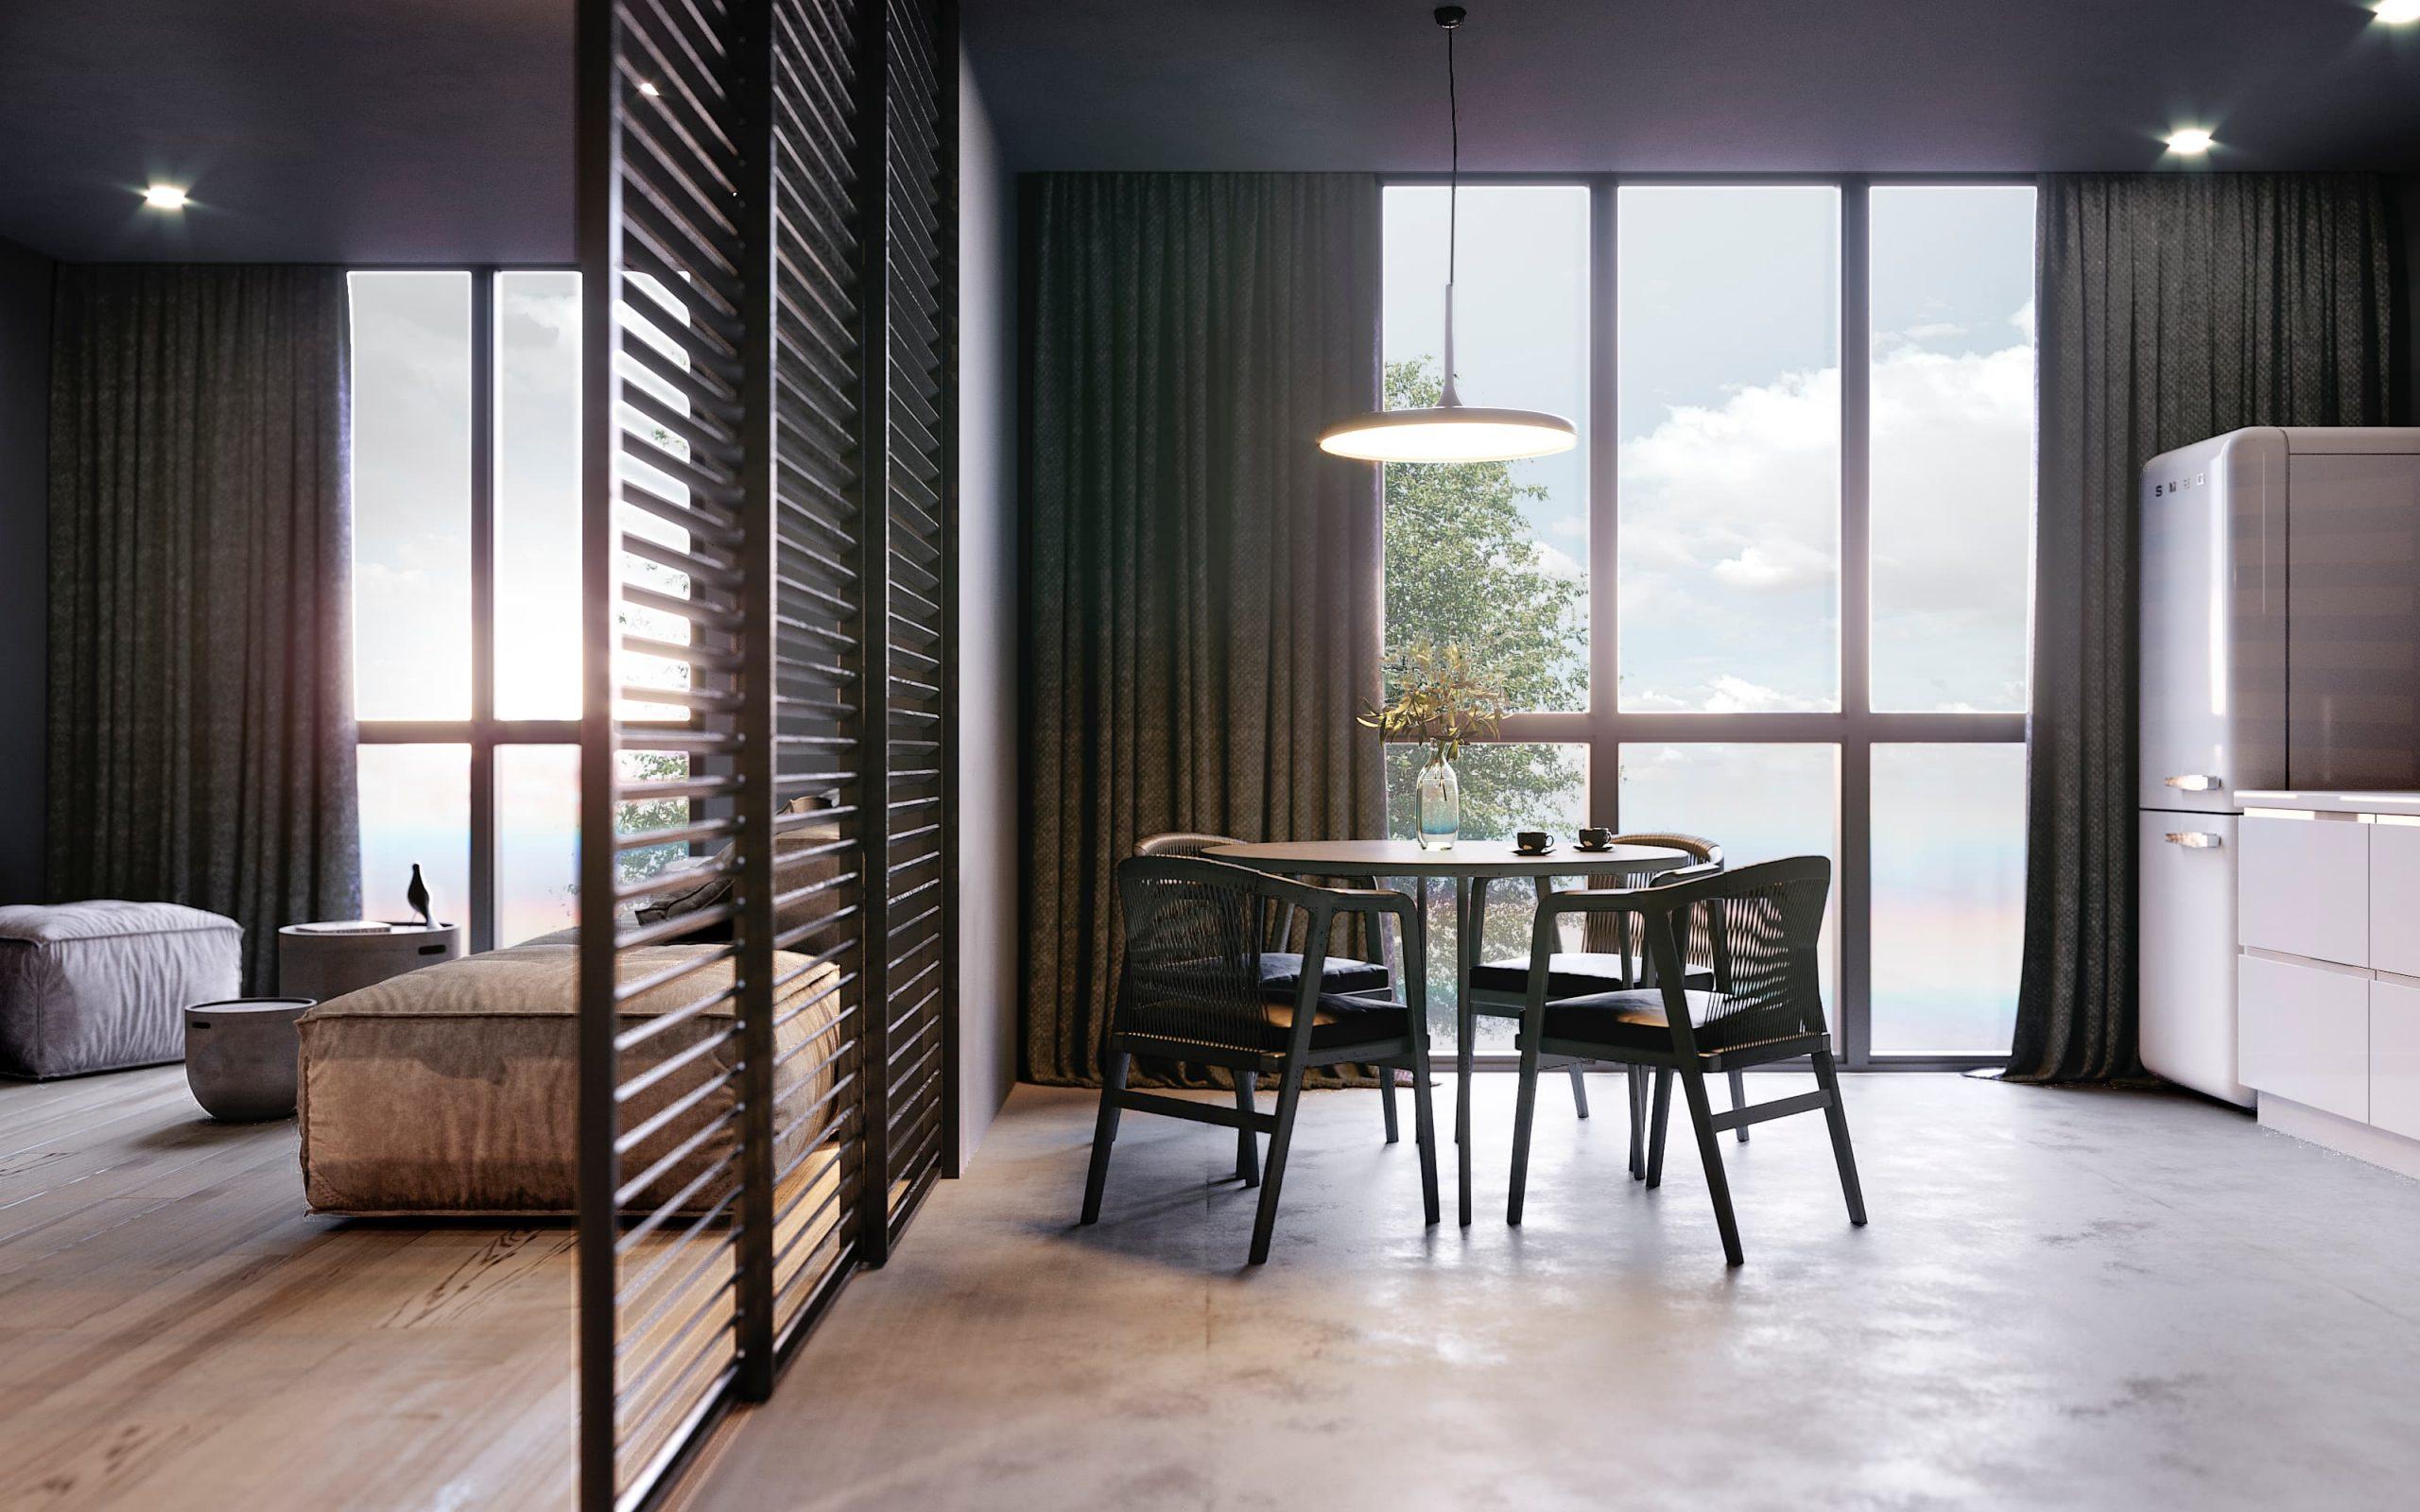 amenajare interioara bucatarie in stil minimalist